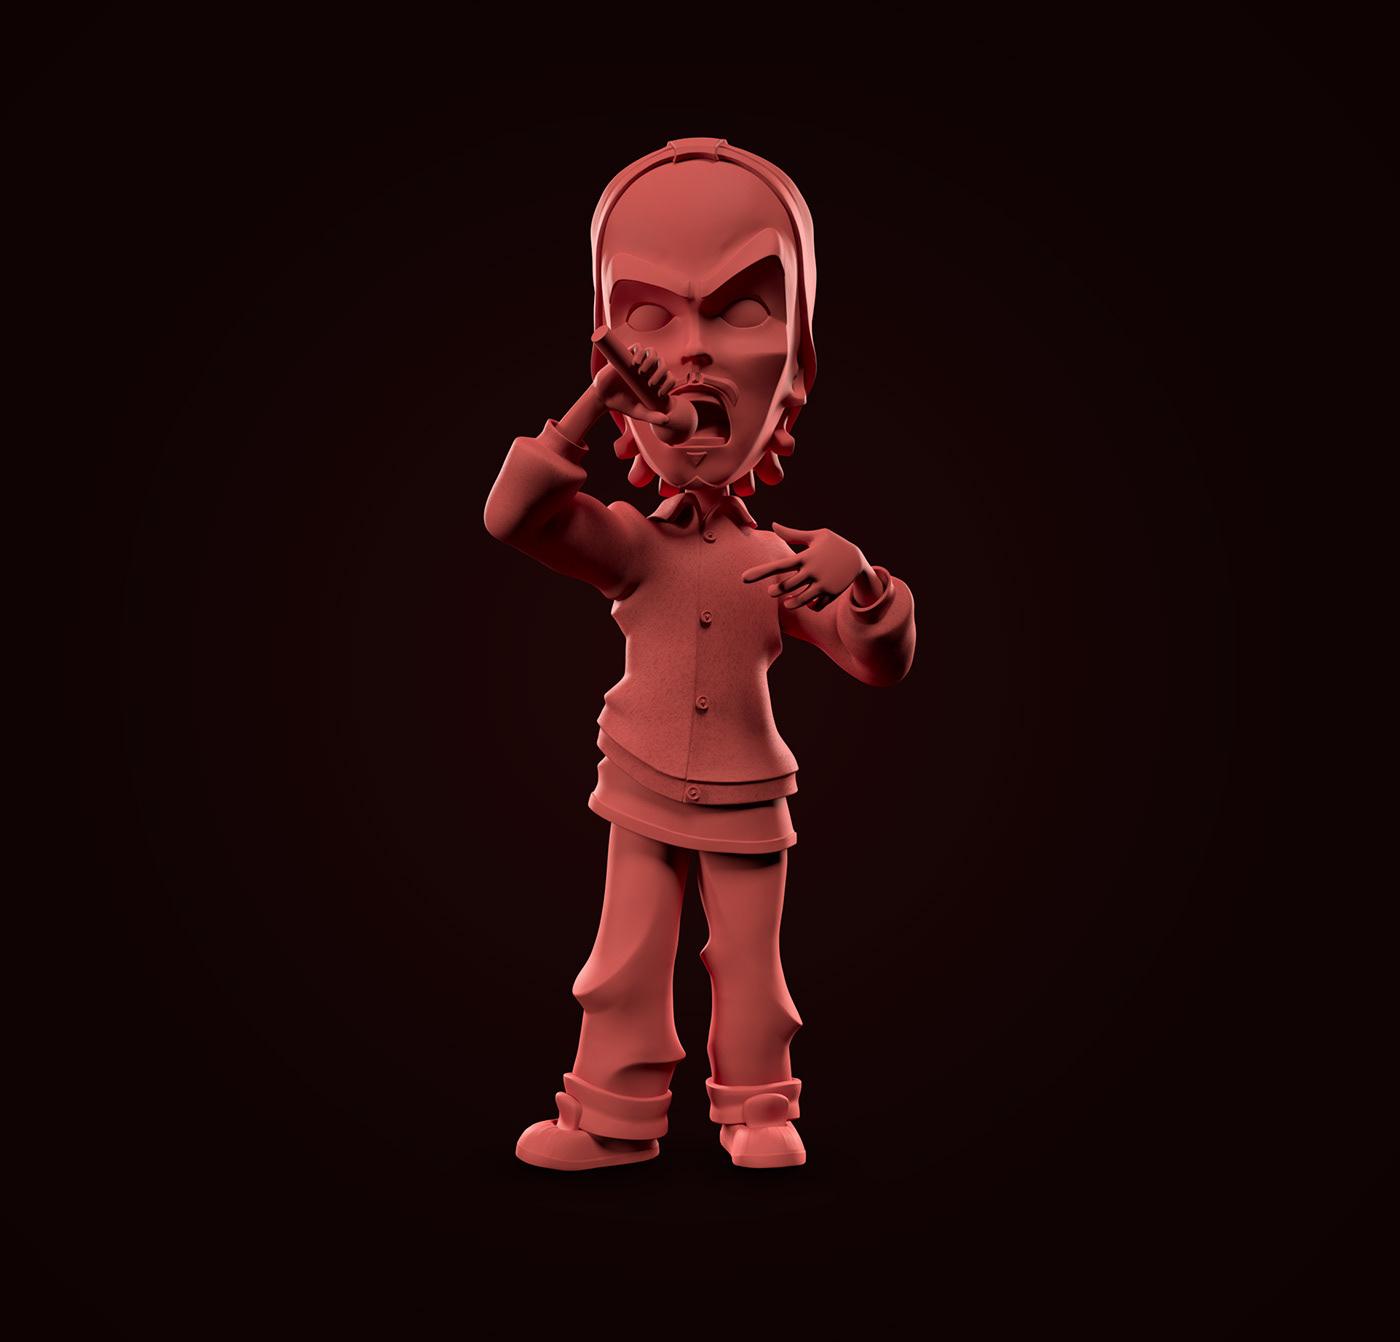 3D Character eduardo taddeu hiphop Mascot mascote modeling music personagem rap